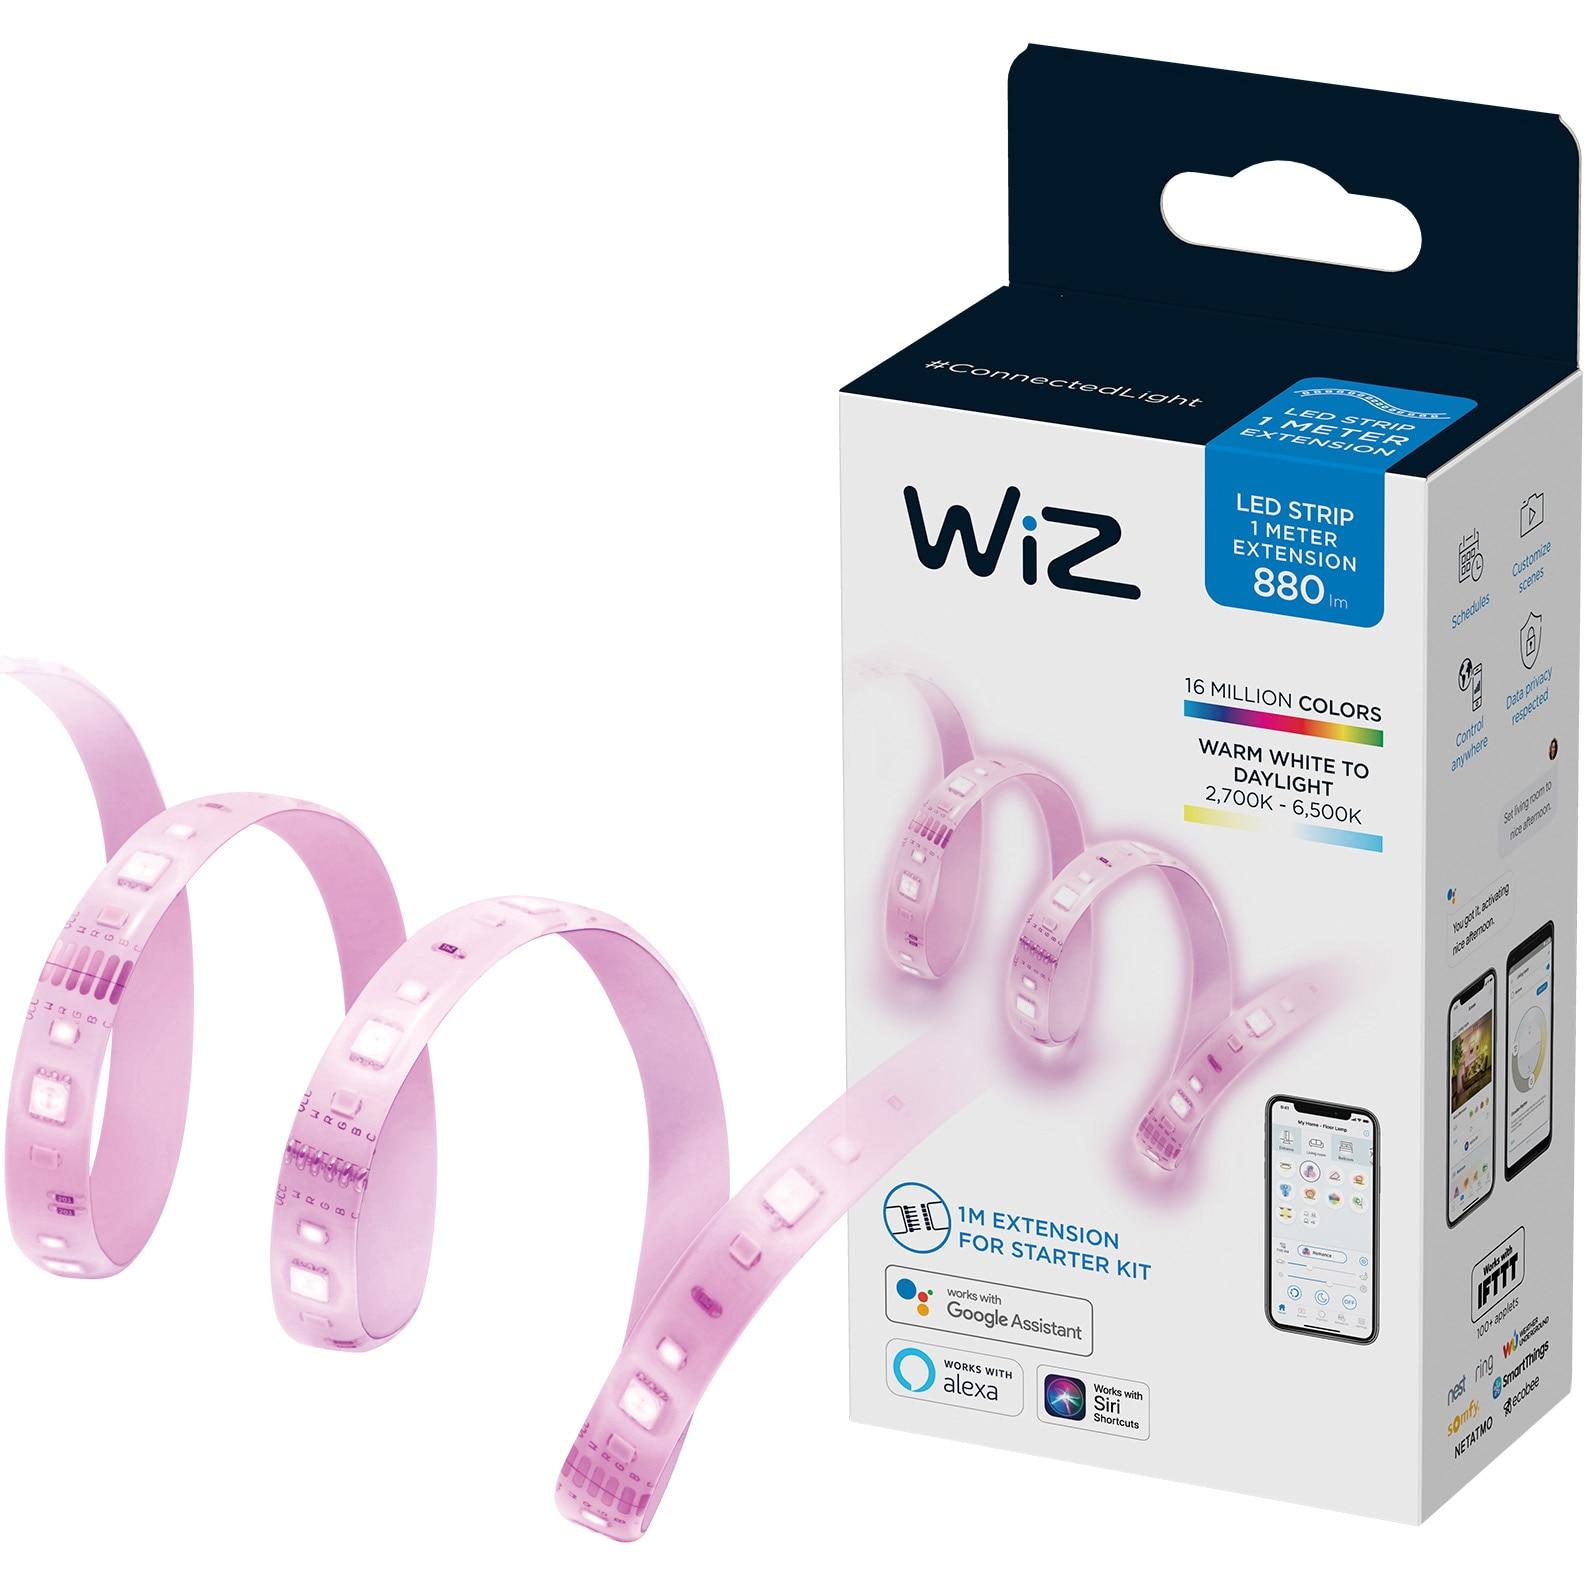 Fotografie Extensie banda LED RGB inteligenta WiZ Connected Extension, 11W, 880 lm, lumina alba/colorata, compatibil Google Assistant/Alexa/Siri, 1 m